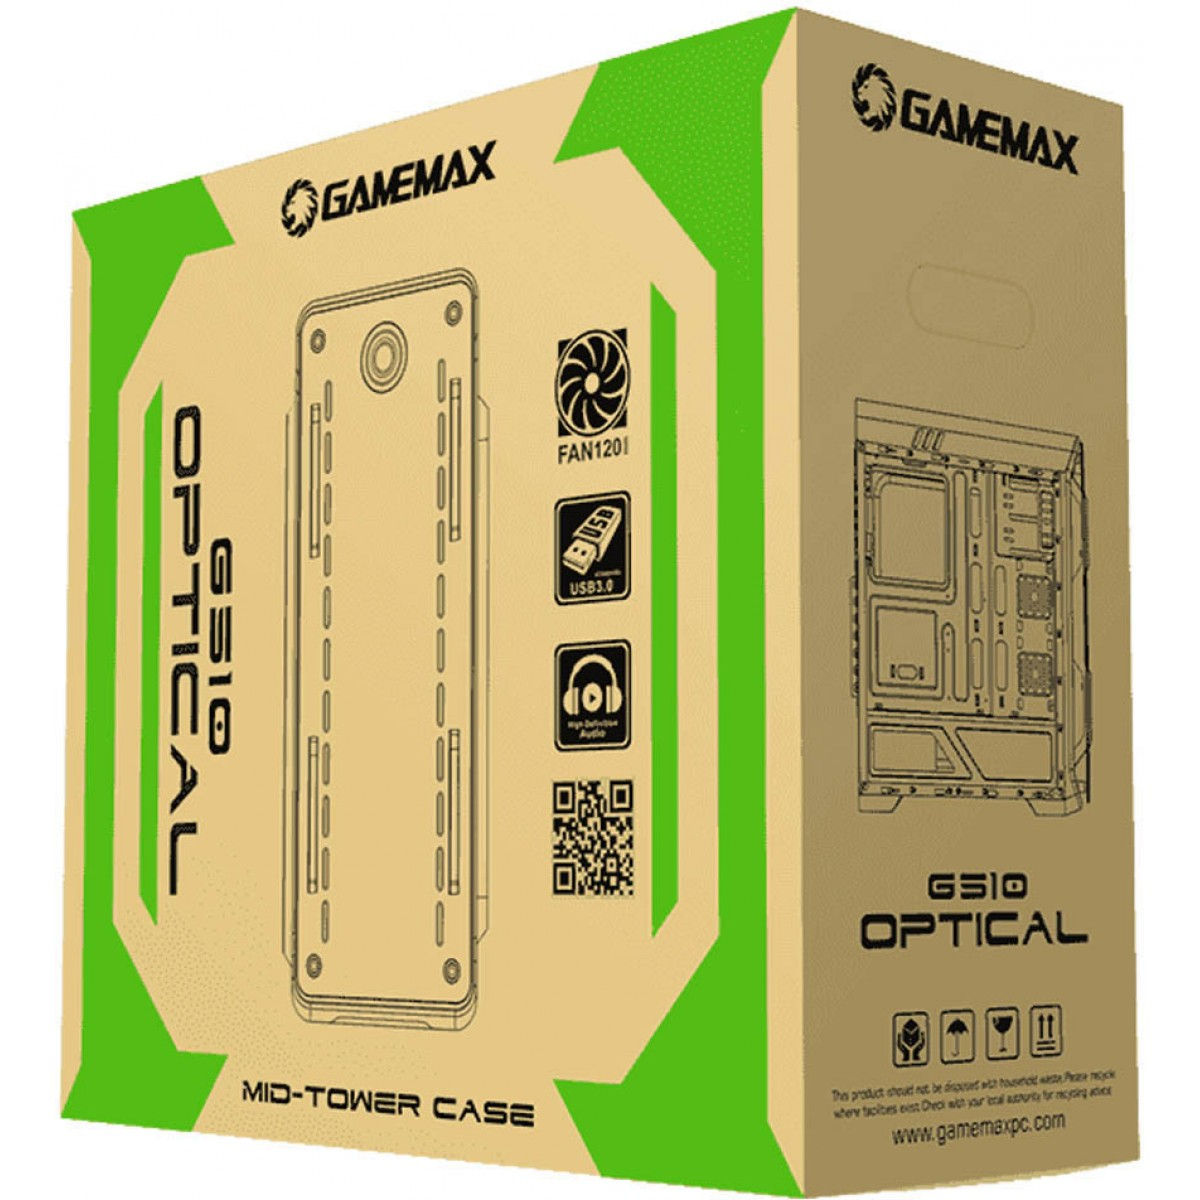 Gabinete Gamer Gamemax Optical G510, Mid Tower, Com 3 Fans, Painel Lateral, Black, Sem Fonte